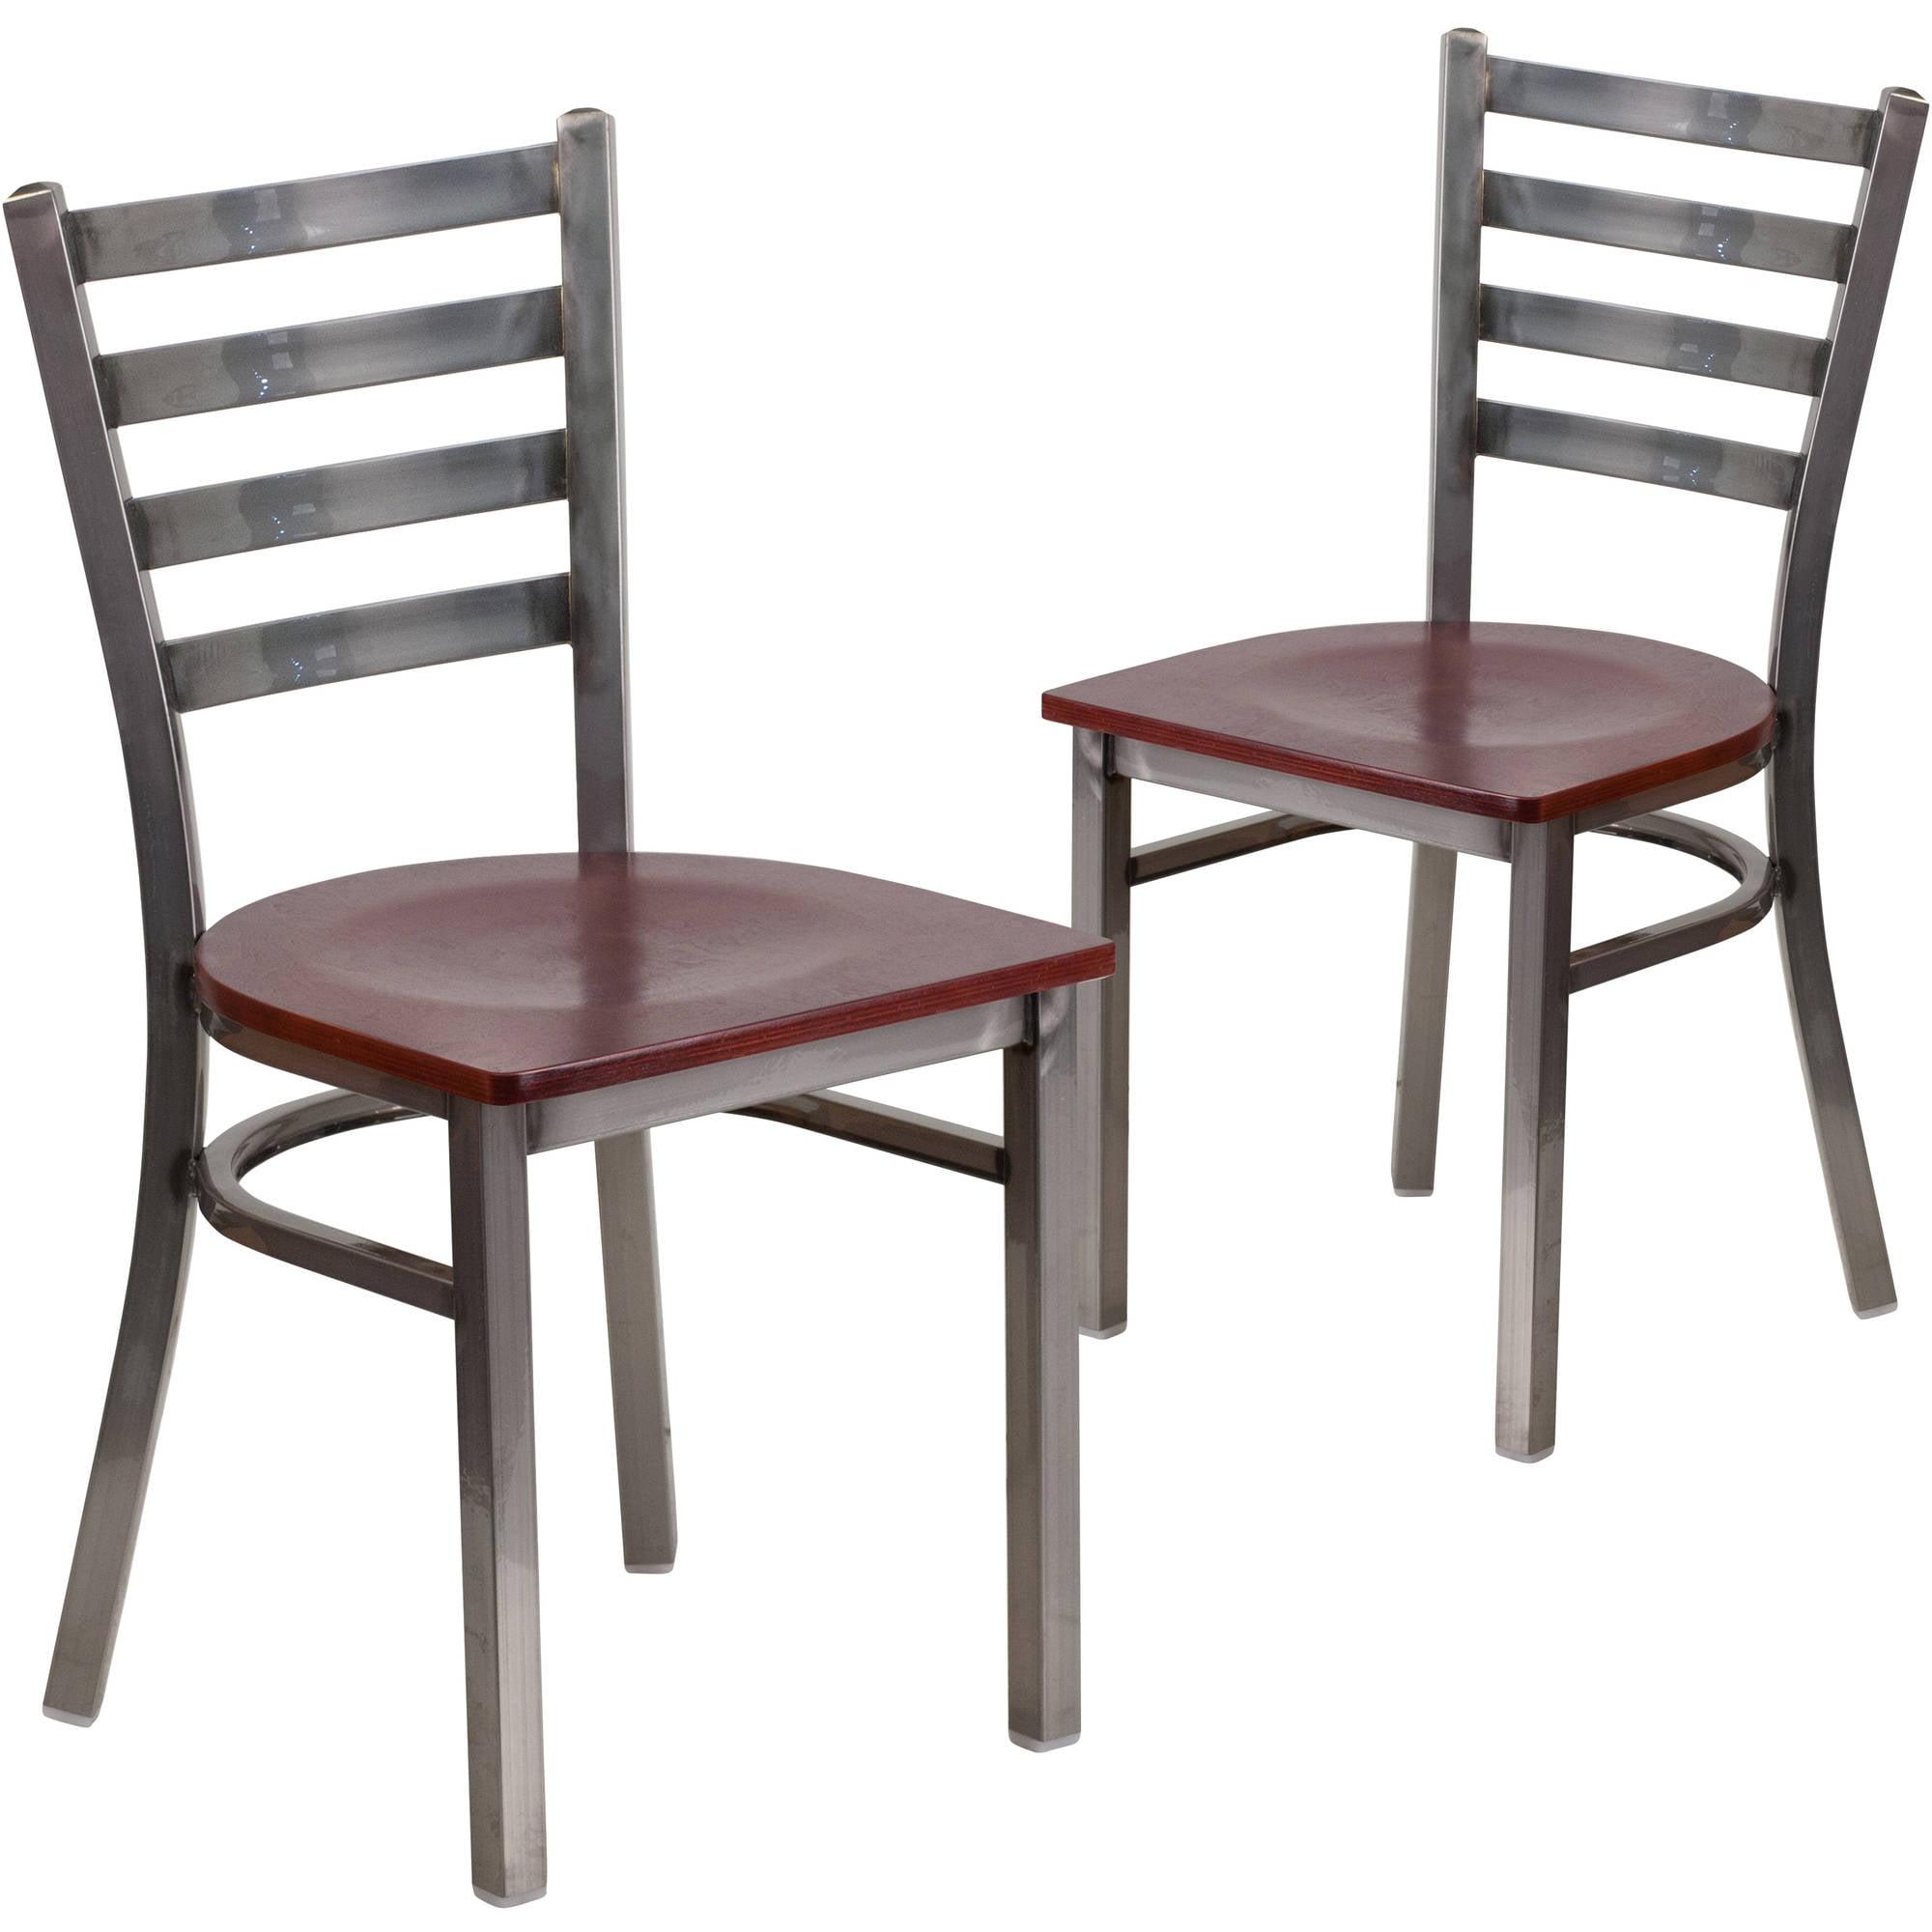 Flash Furniture 2pk HERCULES Series Clear Coated Ladder Back Metal Restaurant Chair, Wood Seat, Multiple Colors